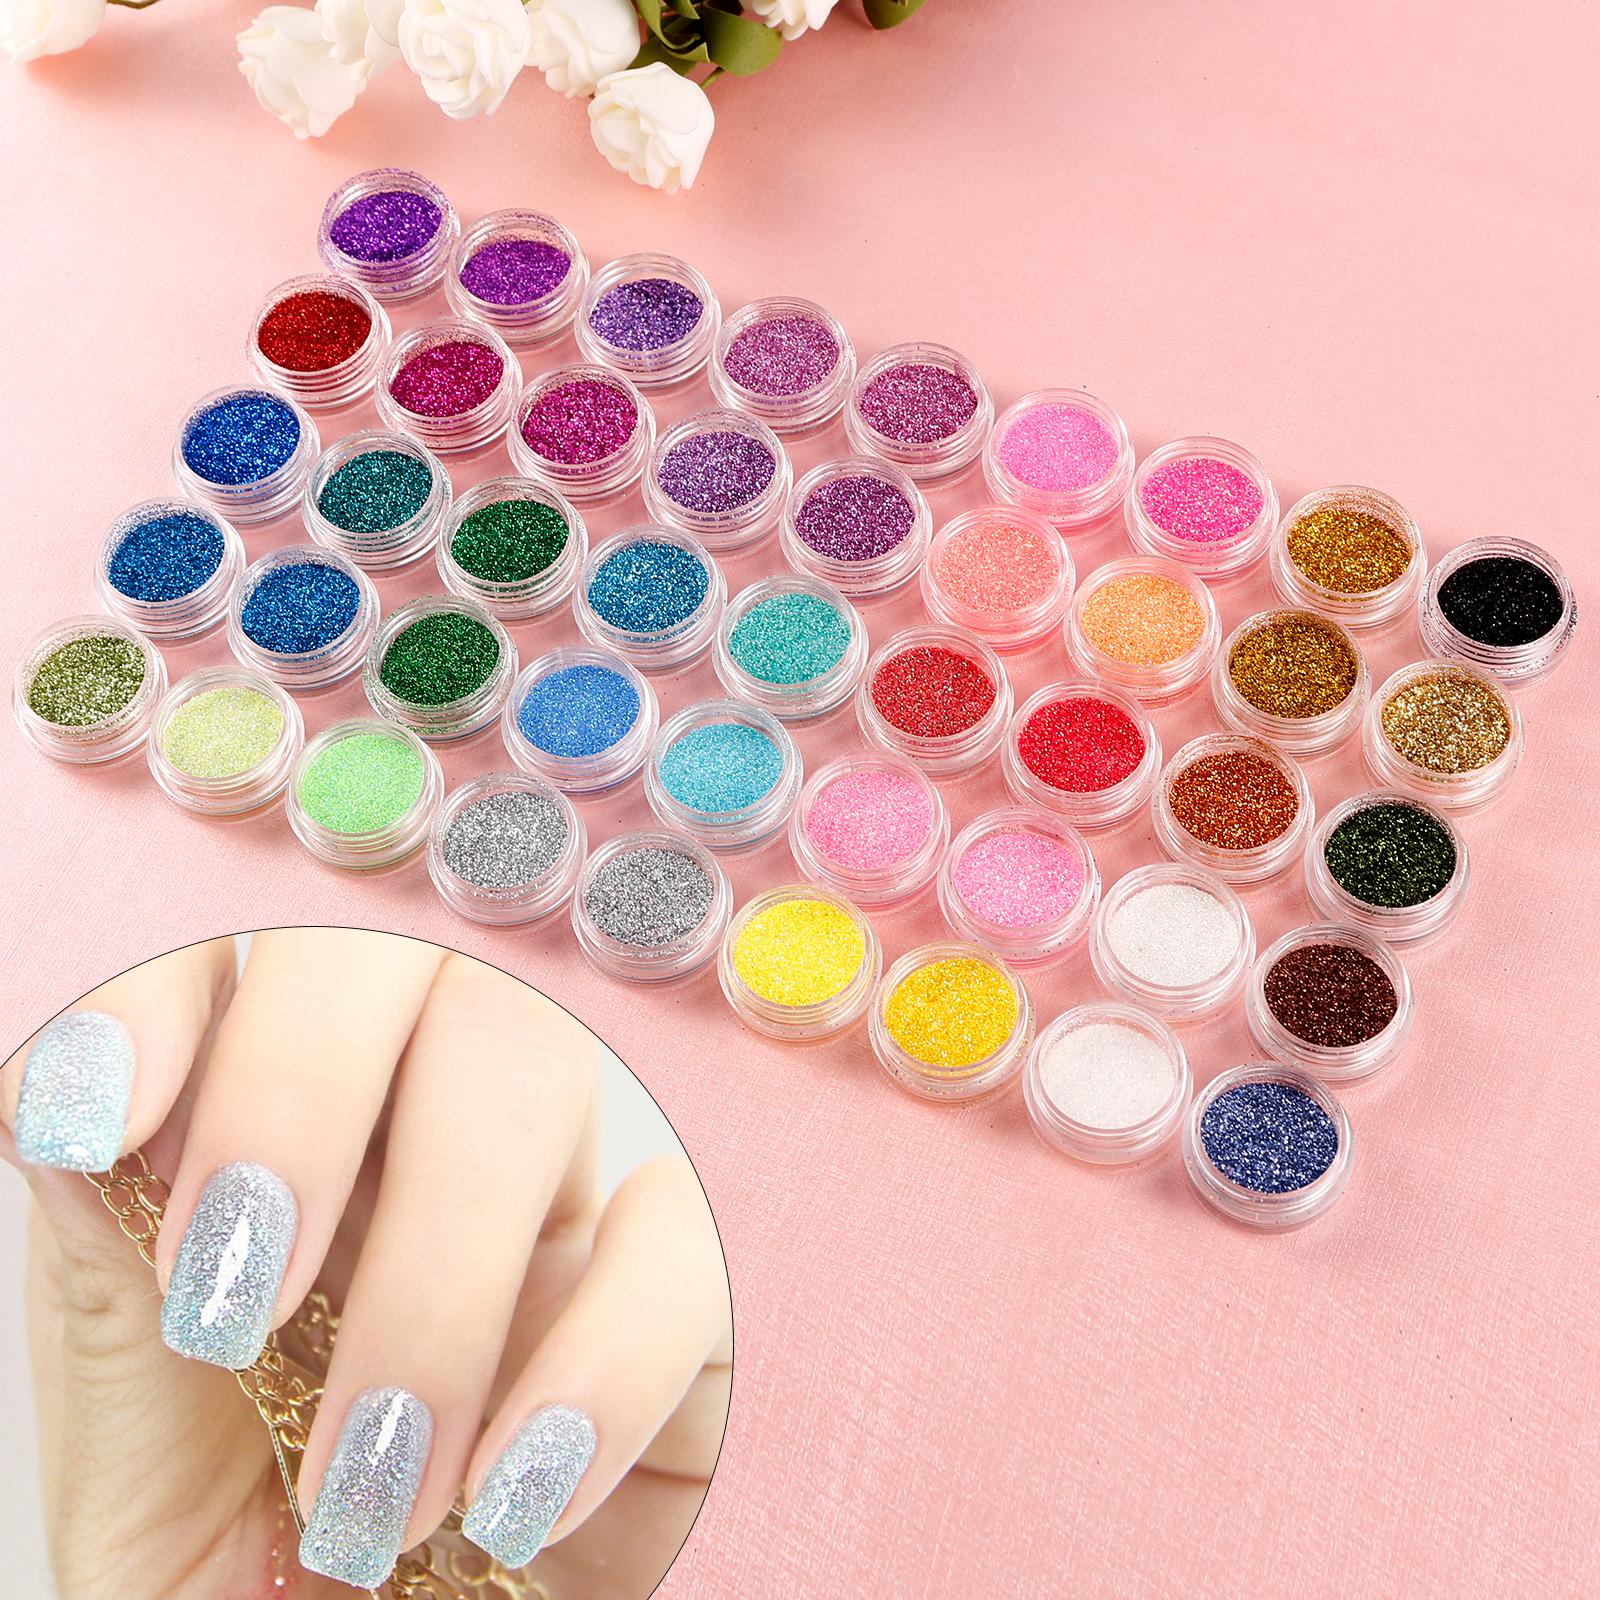 Pack of 45 Color Nail Art Makeup Decoration Glitter Dust Powder DIY ...